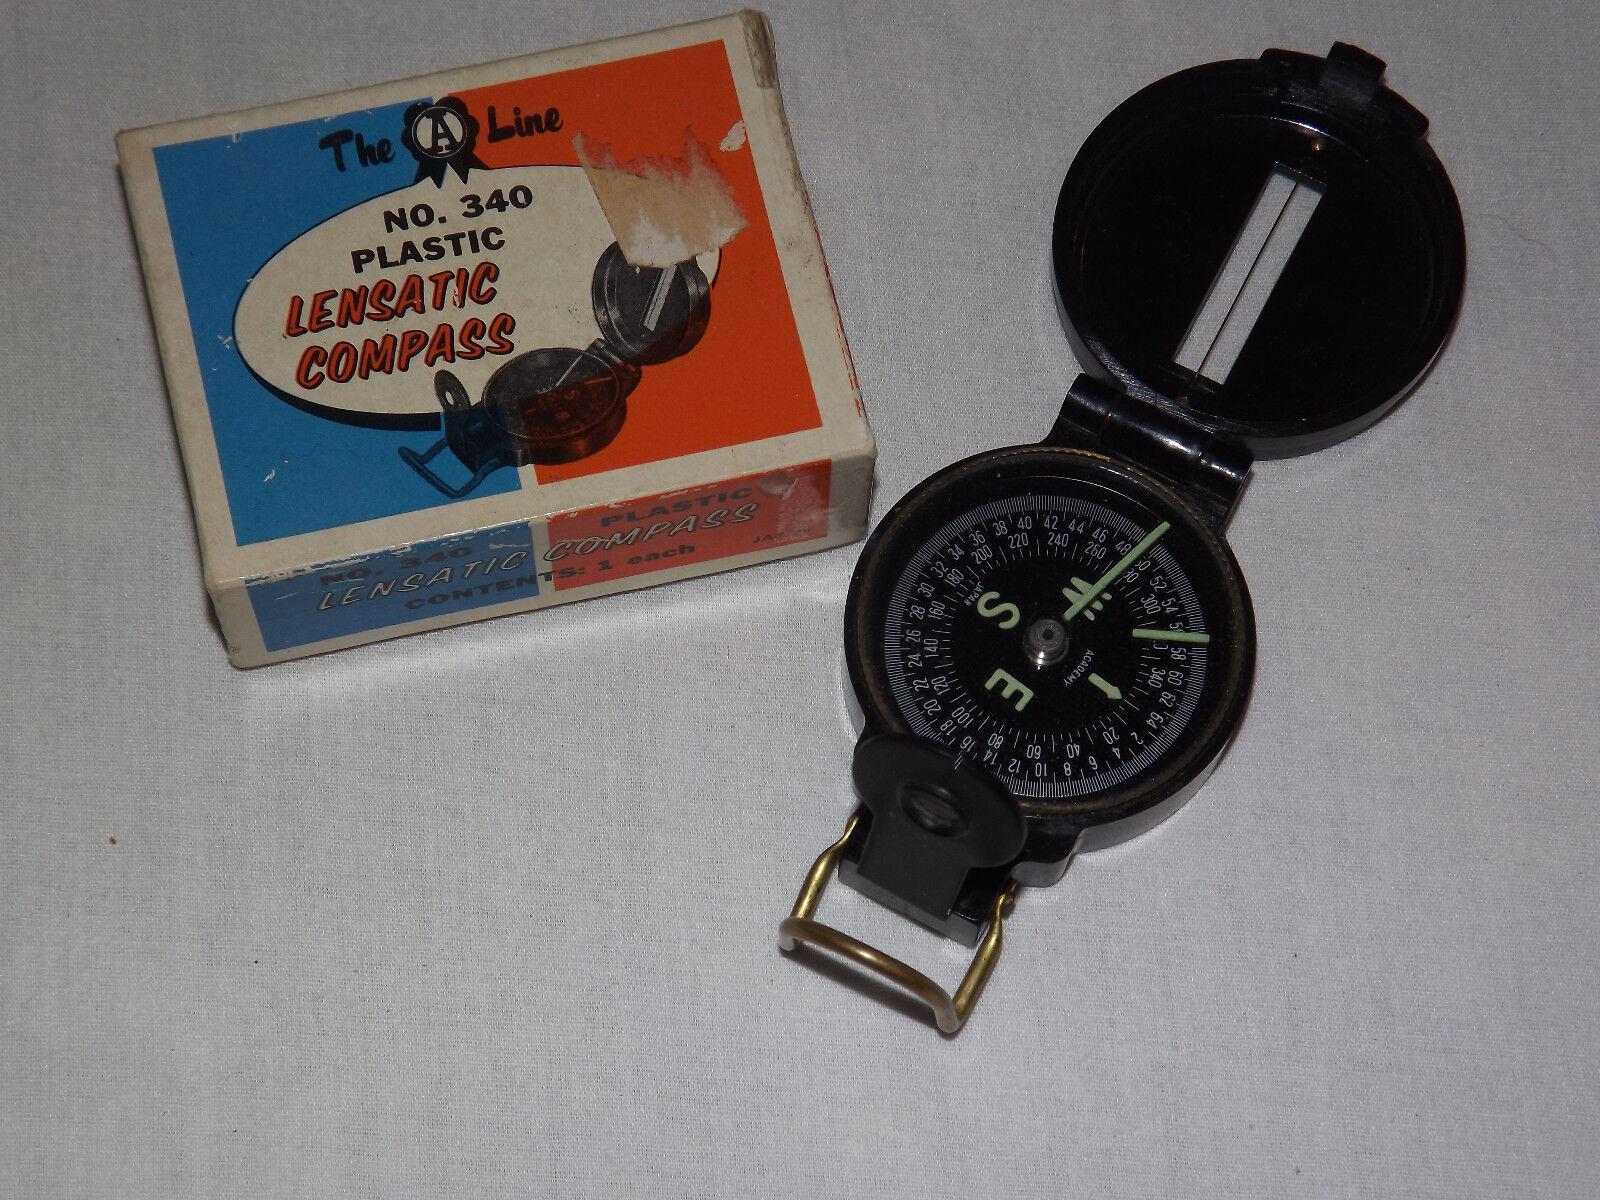 VINTAGE 1960-70S THE A LINE PLASTIC LENSATIC COMPASS IN BOX